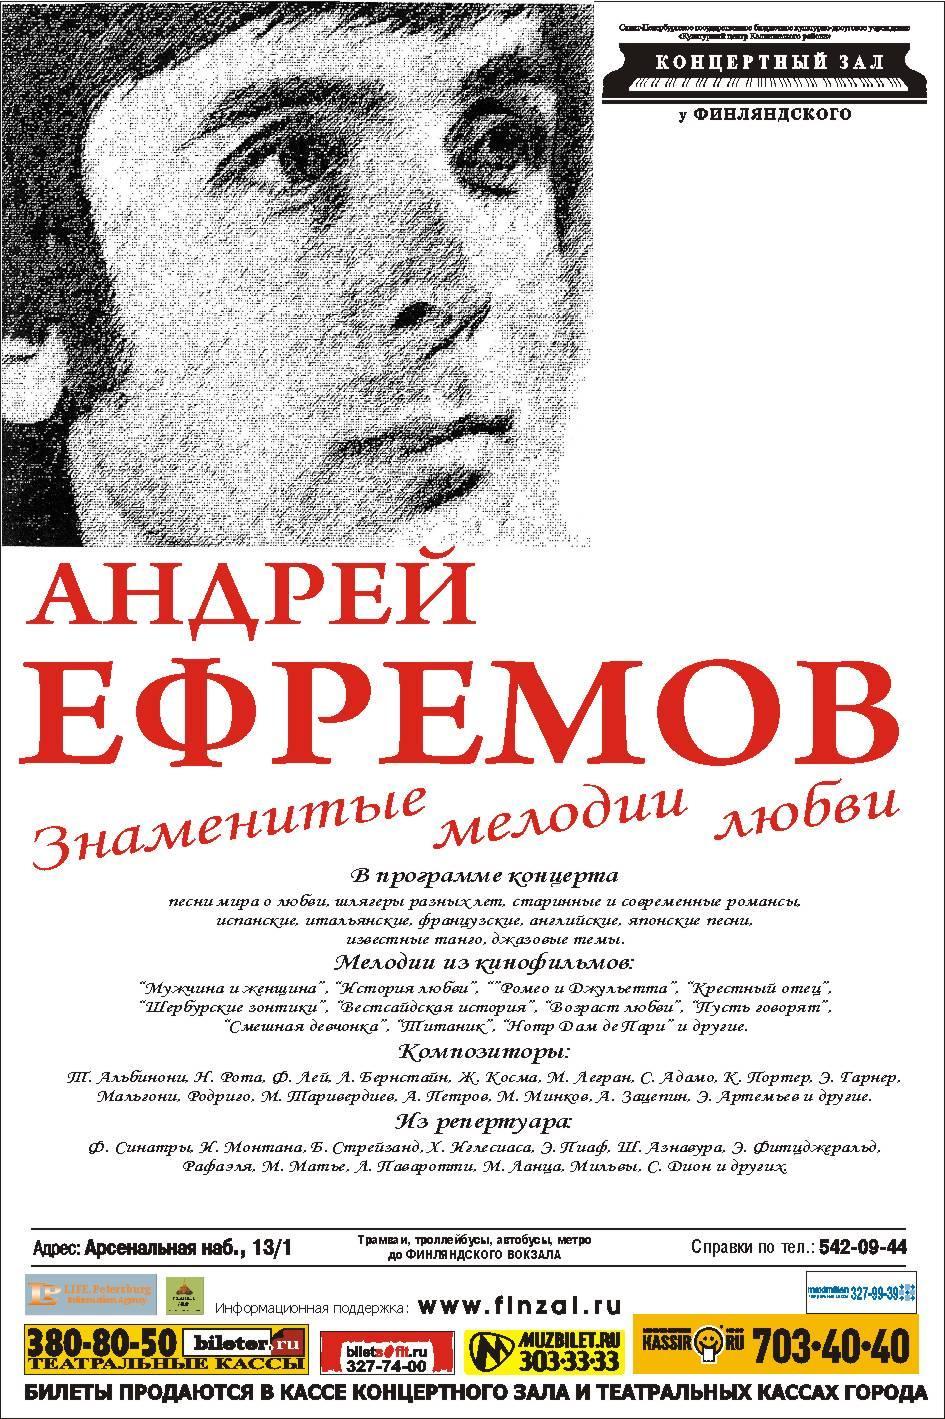 http://andreyefremov.ru/POSTERS/post5.jpg